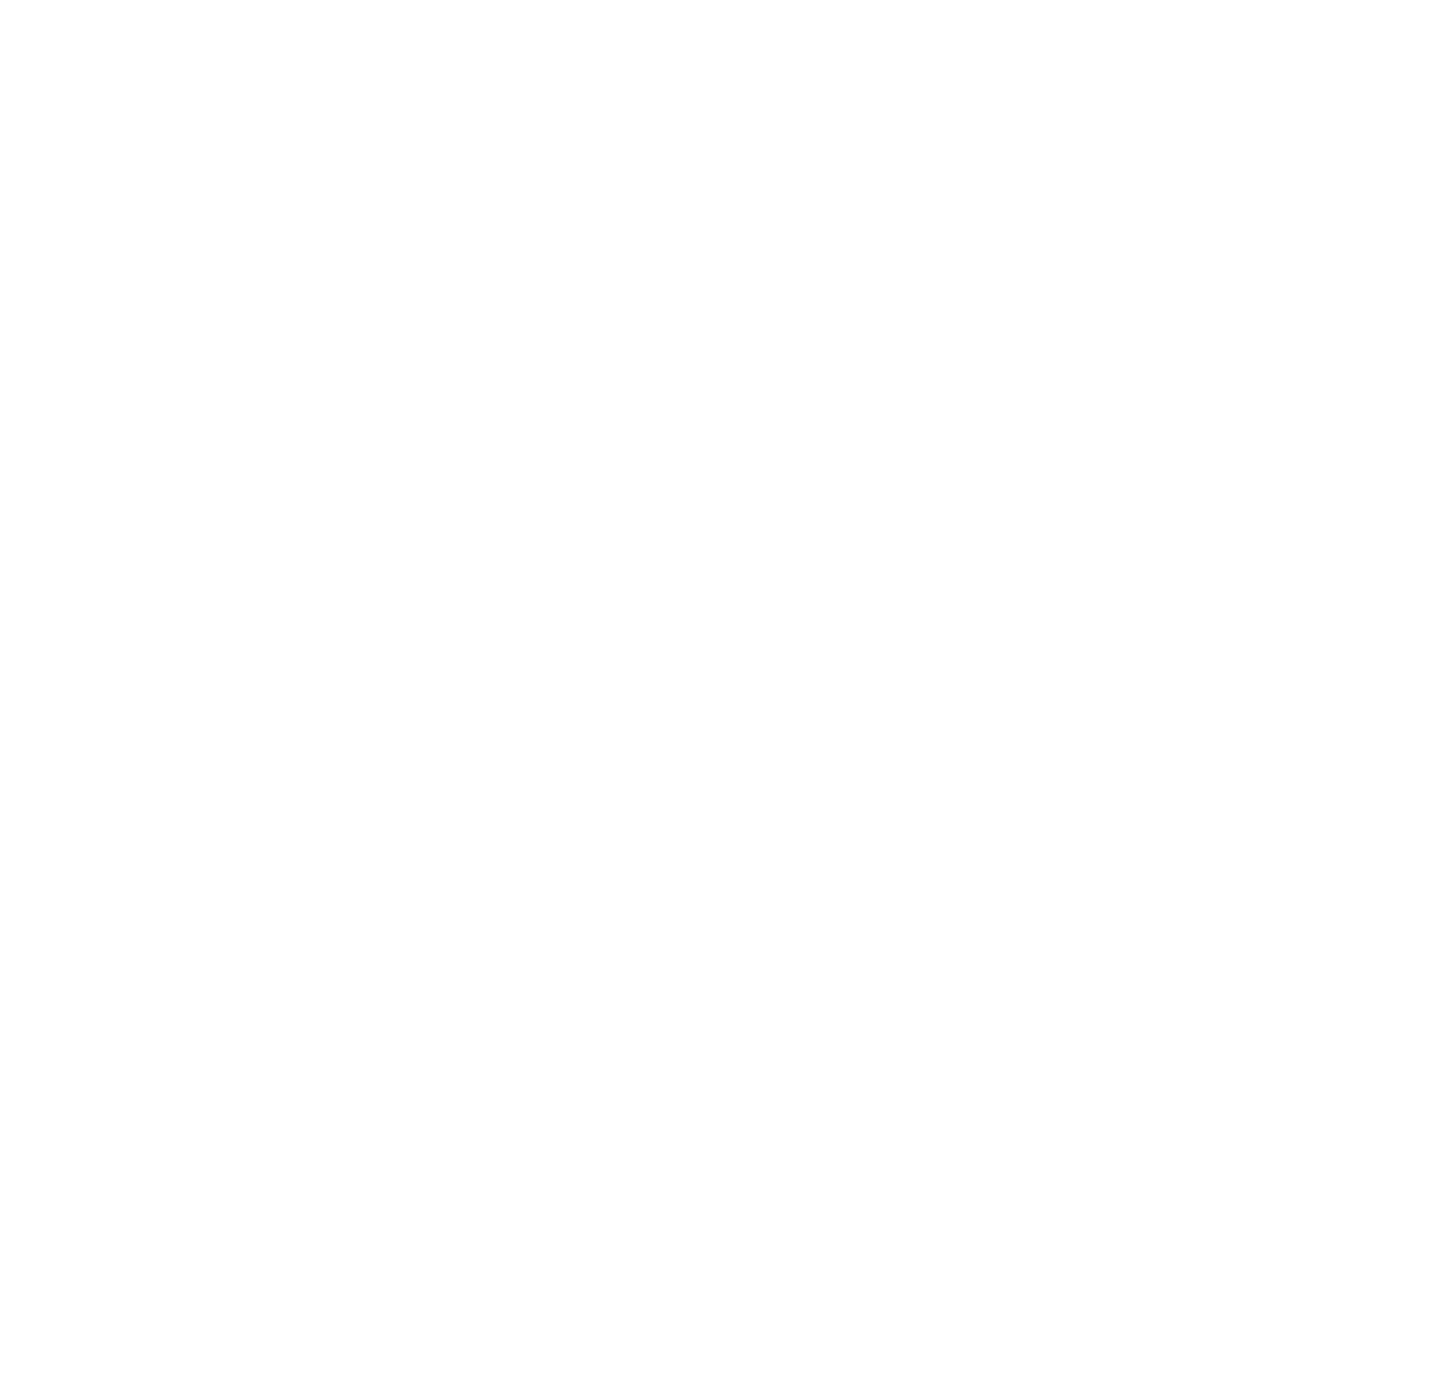 iso-90012015 Arriendos modulares